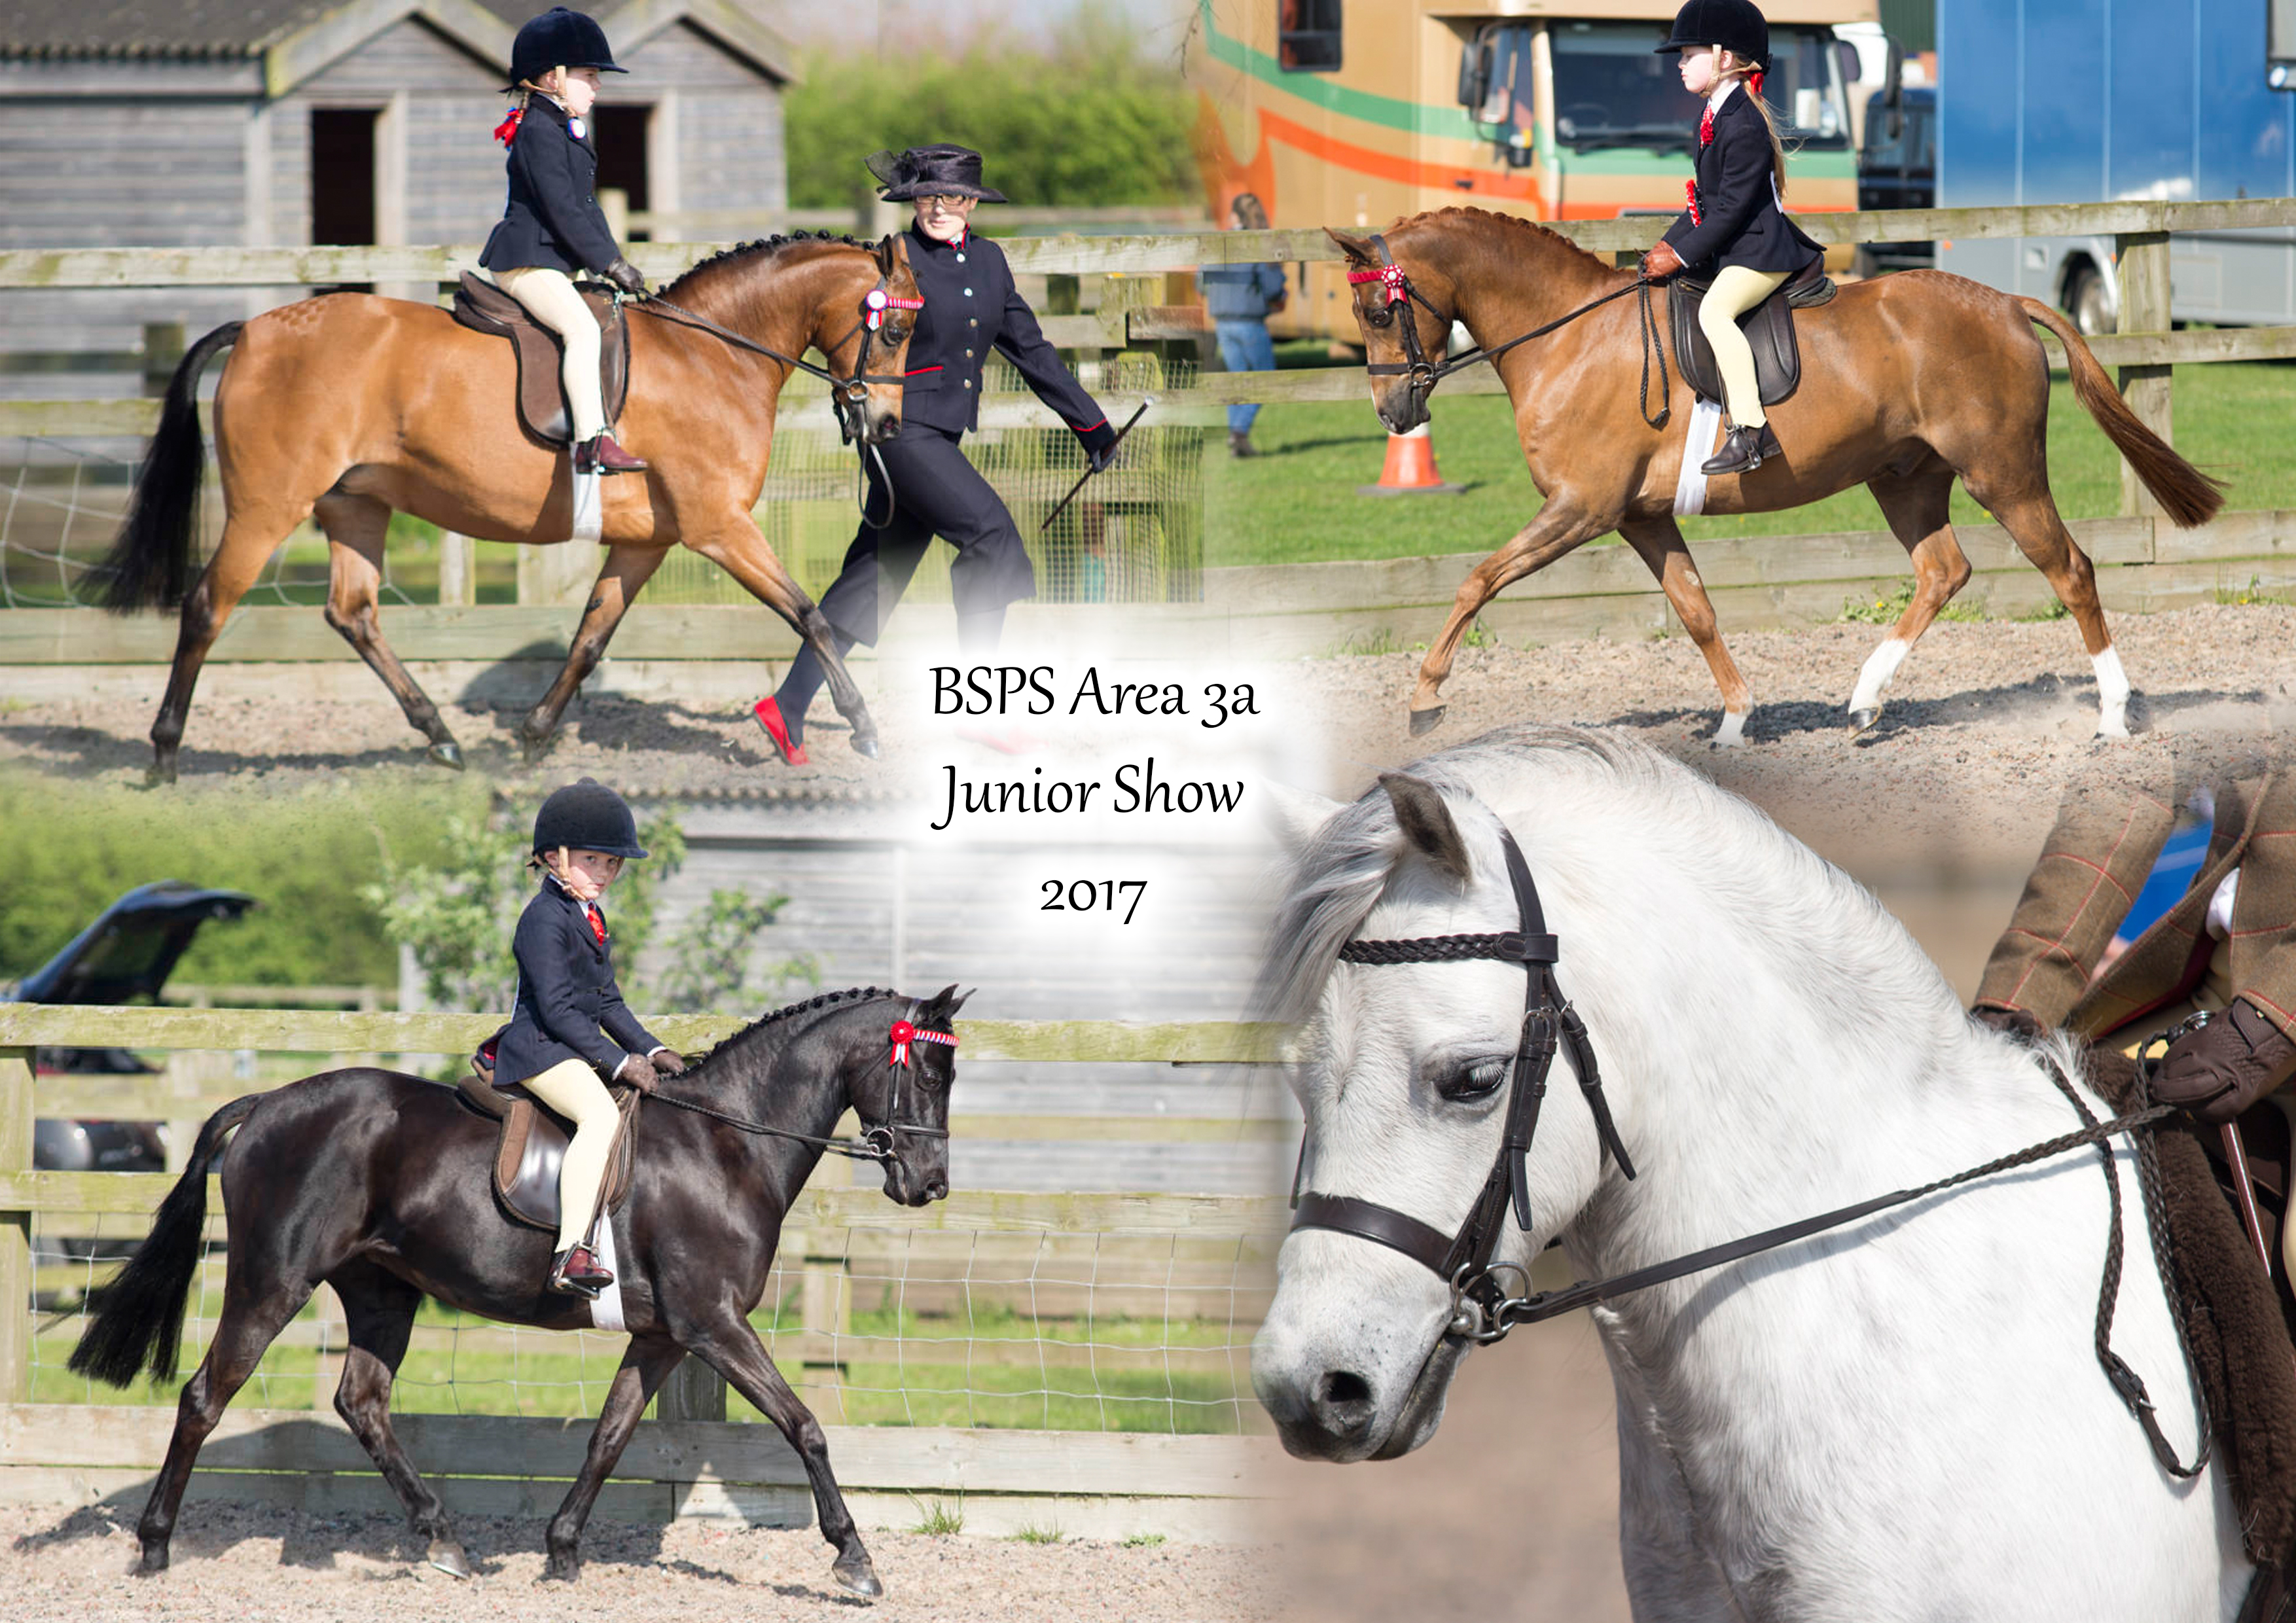 BSPS Area 3a Junior Show 2017